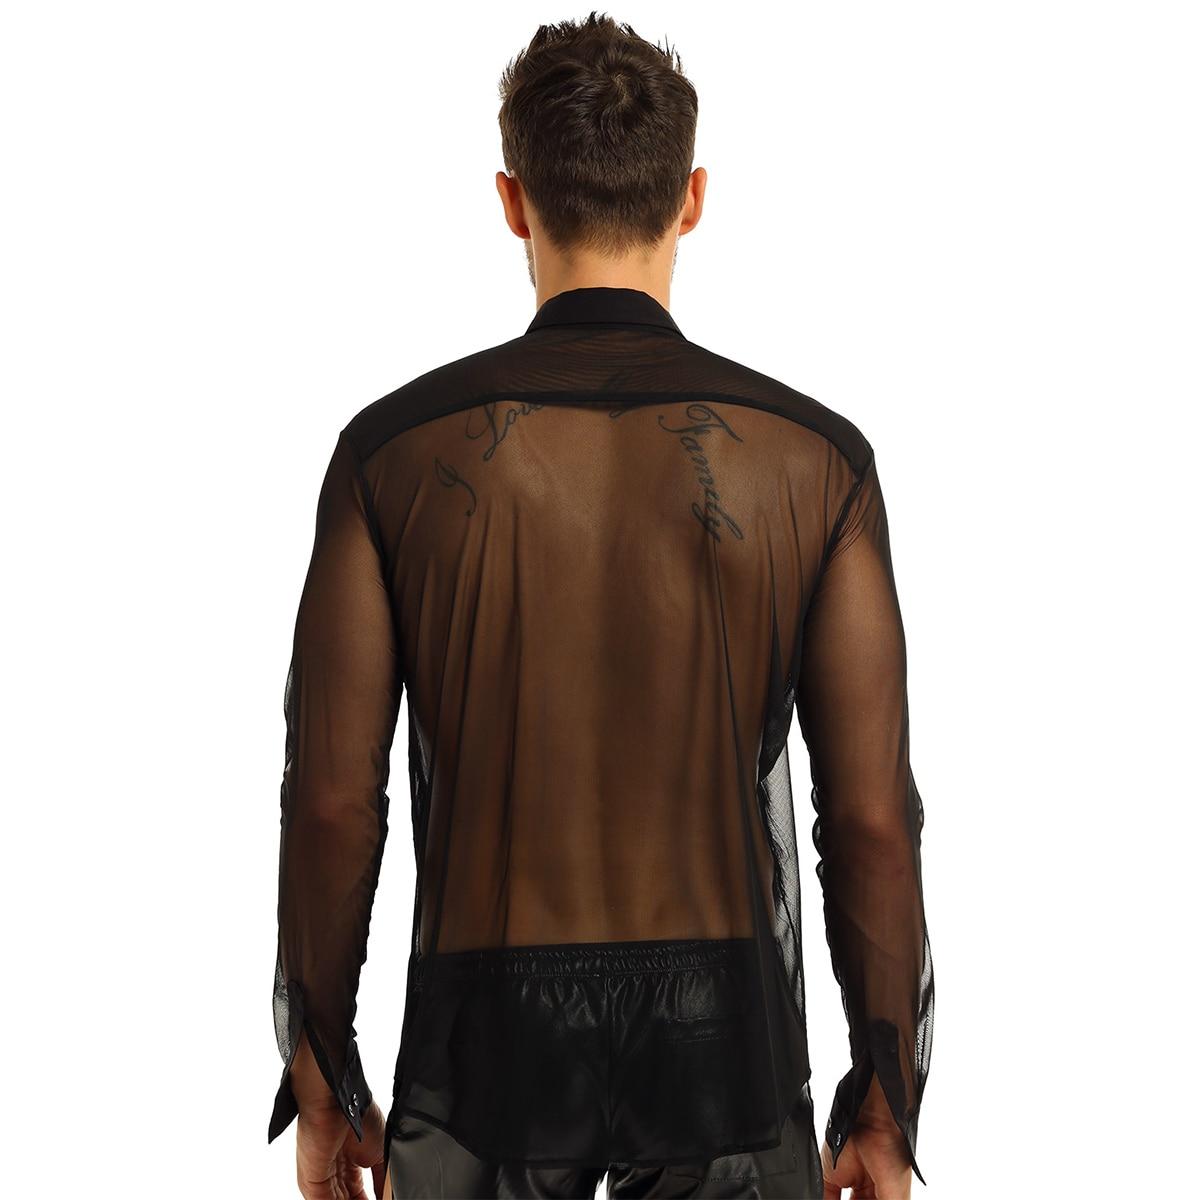 Image 4 - iiniim Mens Fashion See Through Mesh Long Sleeve Clubwear Turn down Collar Top Shirt for Club Evening Party WetLook Shirtsf shirtsfashion shirtsee through shirts -